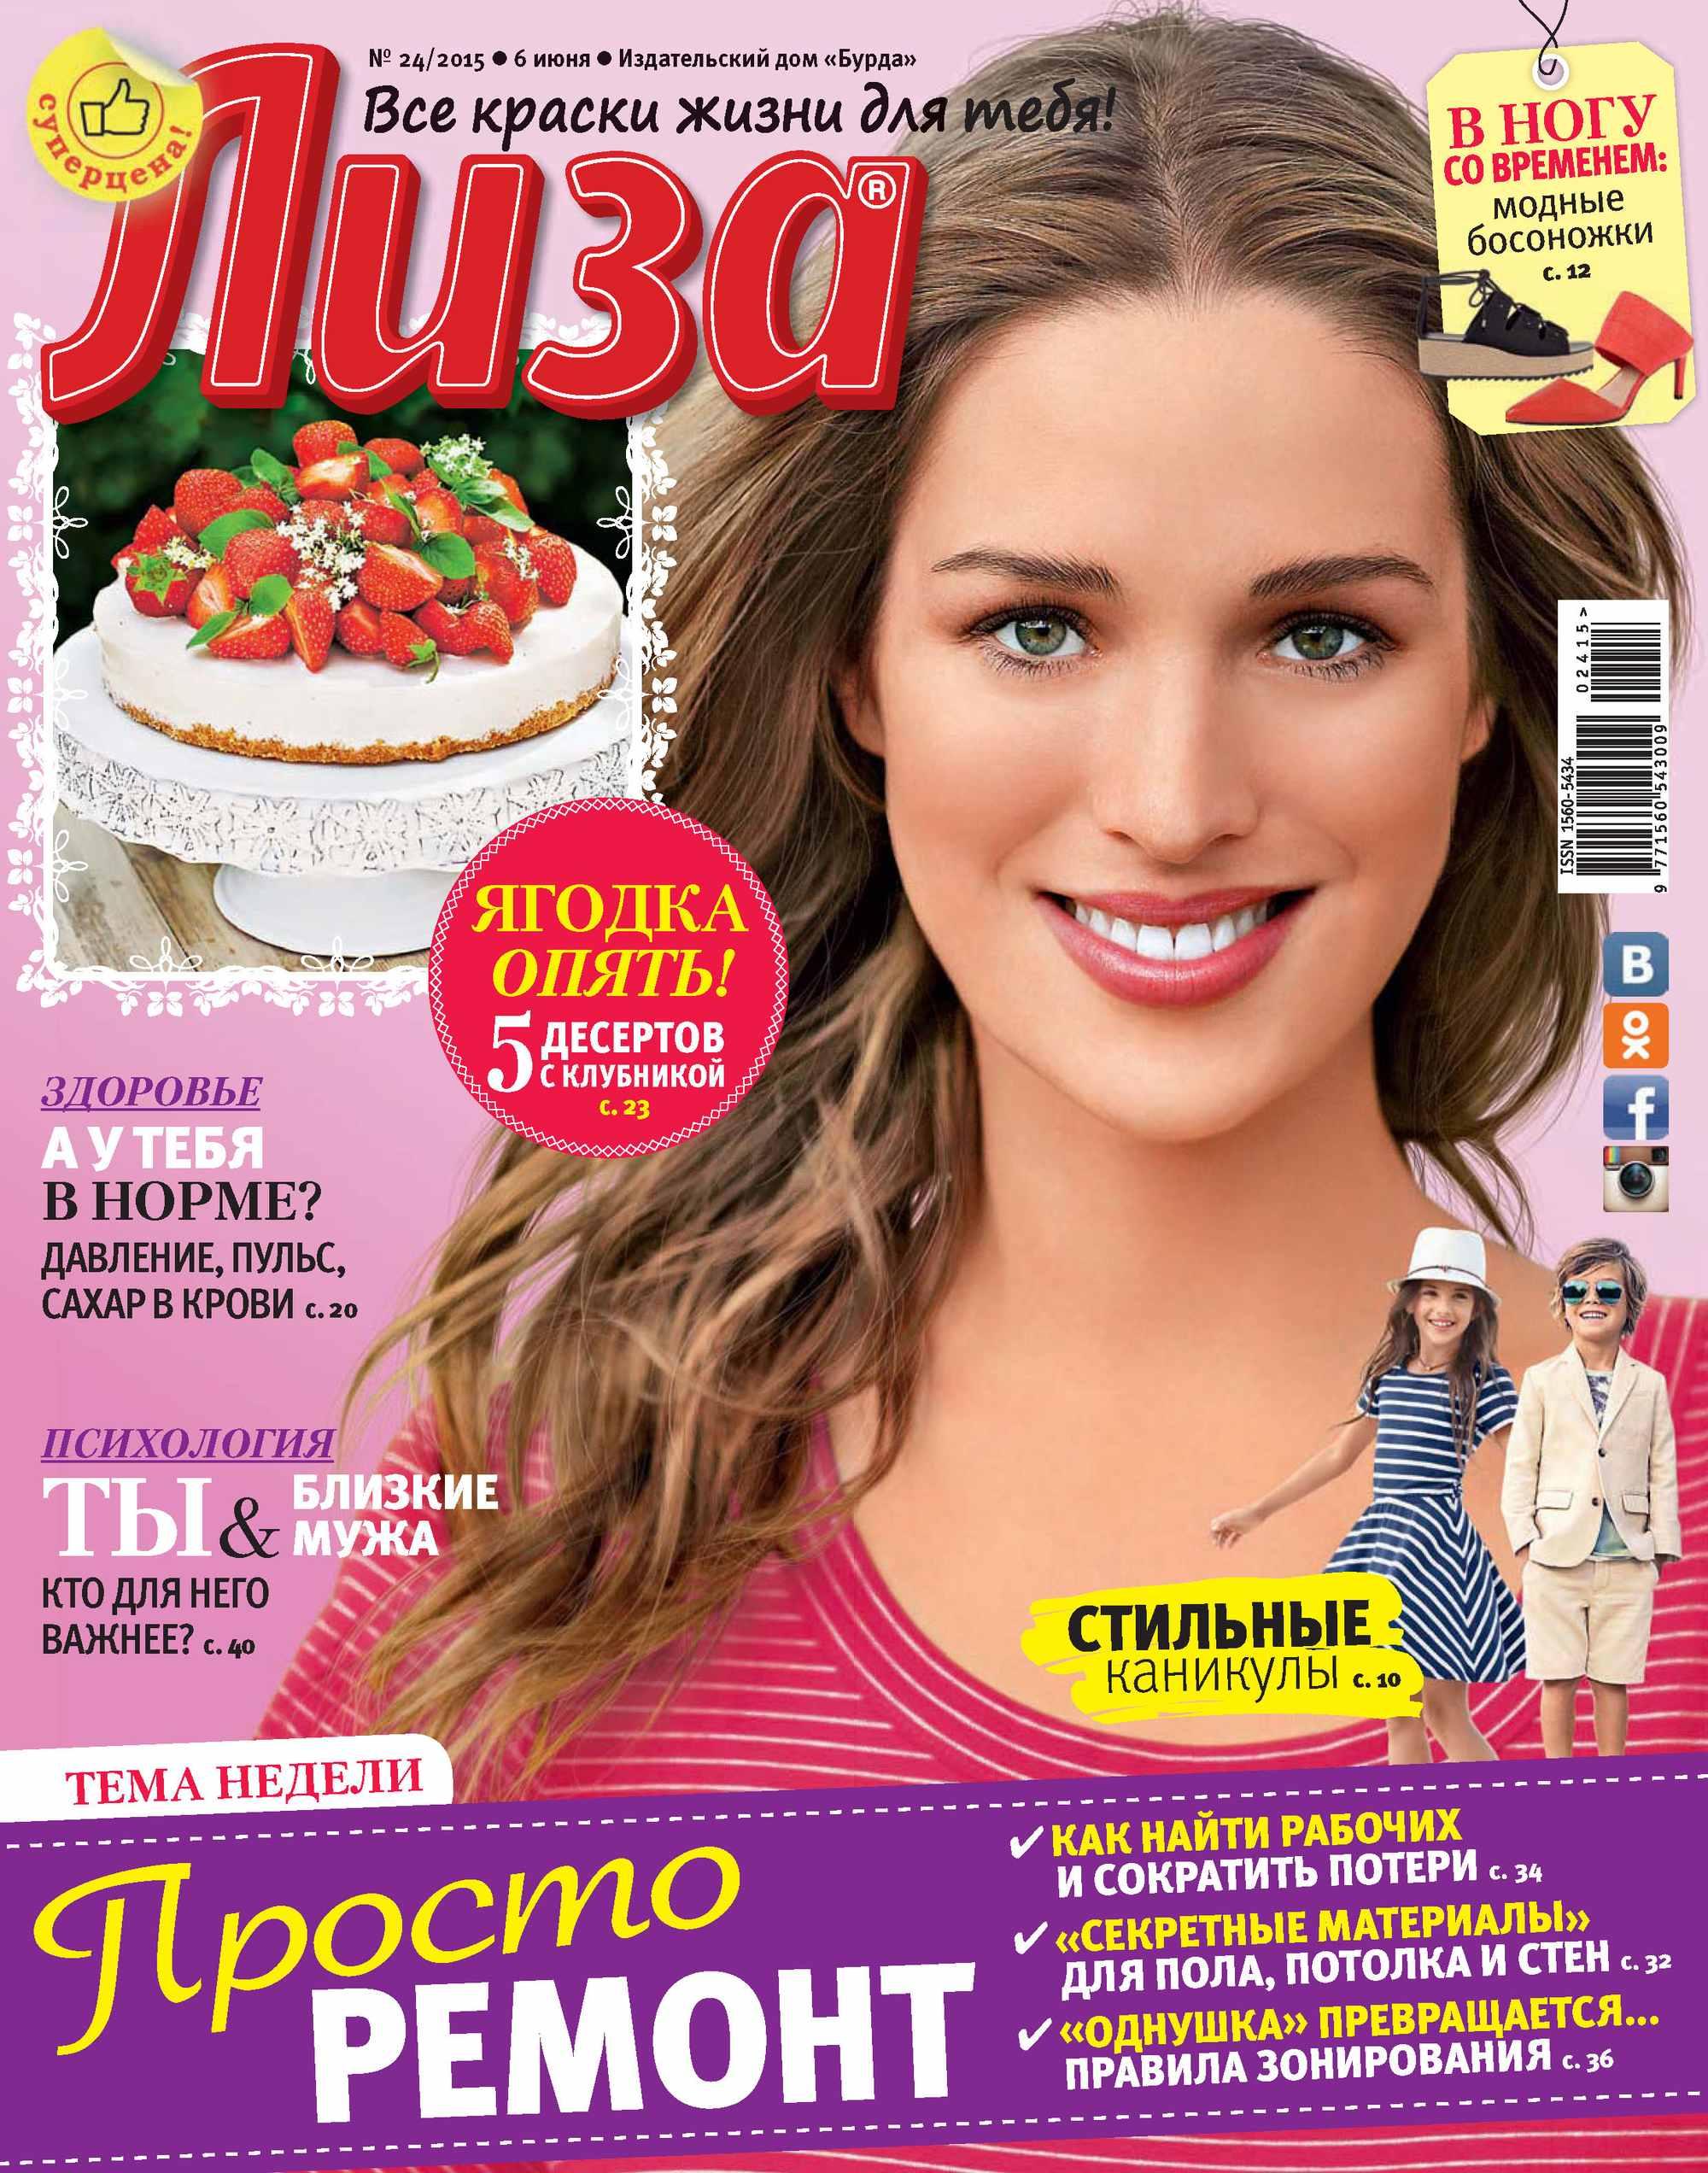 ИД «Бурда» Журнал «Лиза» №24/2015 ид бурда журнал лиза 08 2015